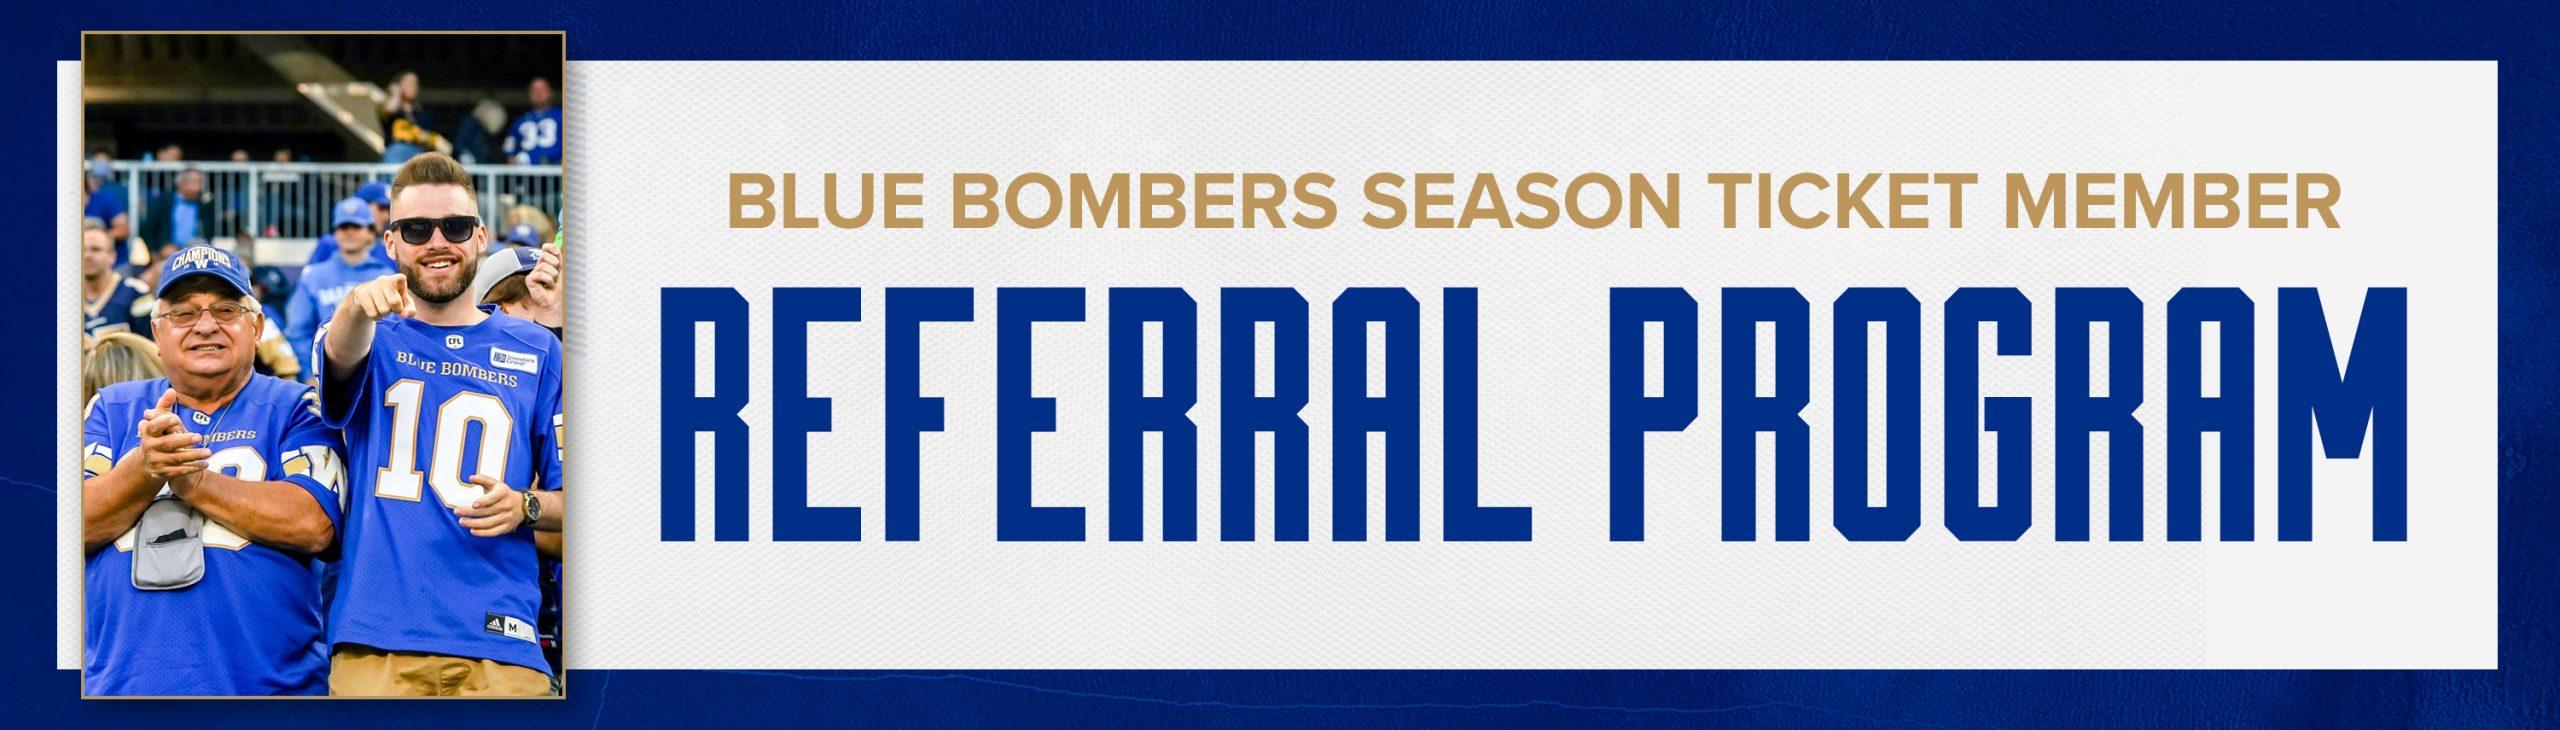 Winnipeg Blue Bombers Season Ticket Member Referral Program